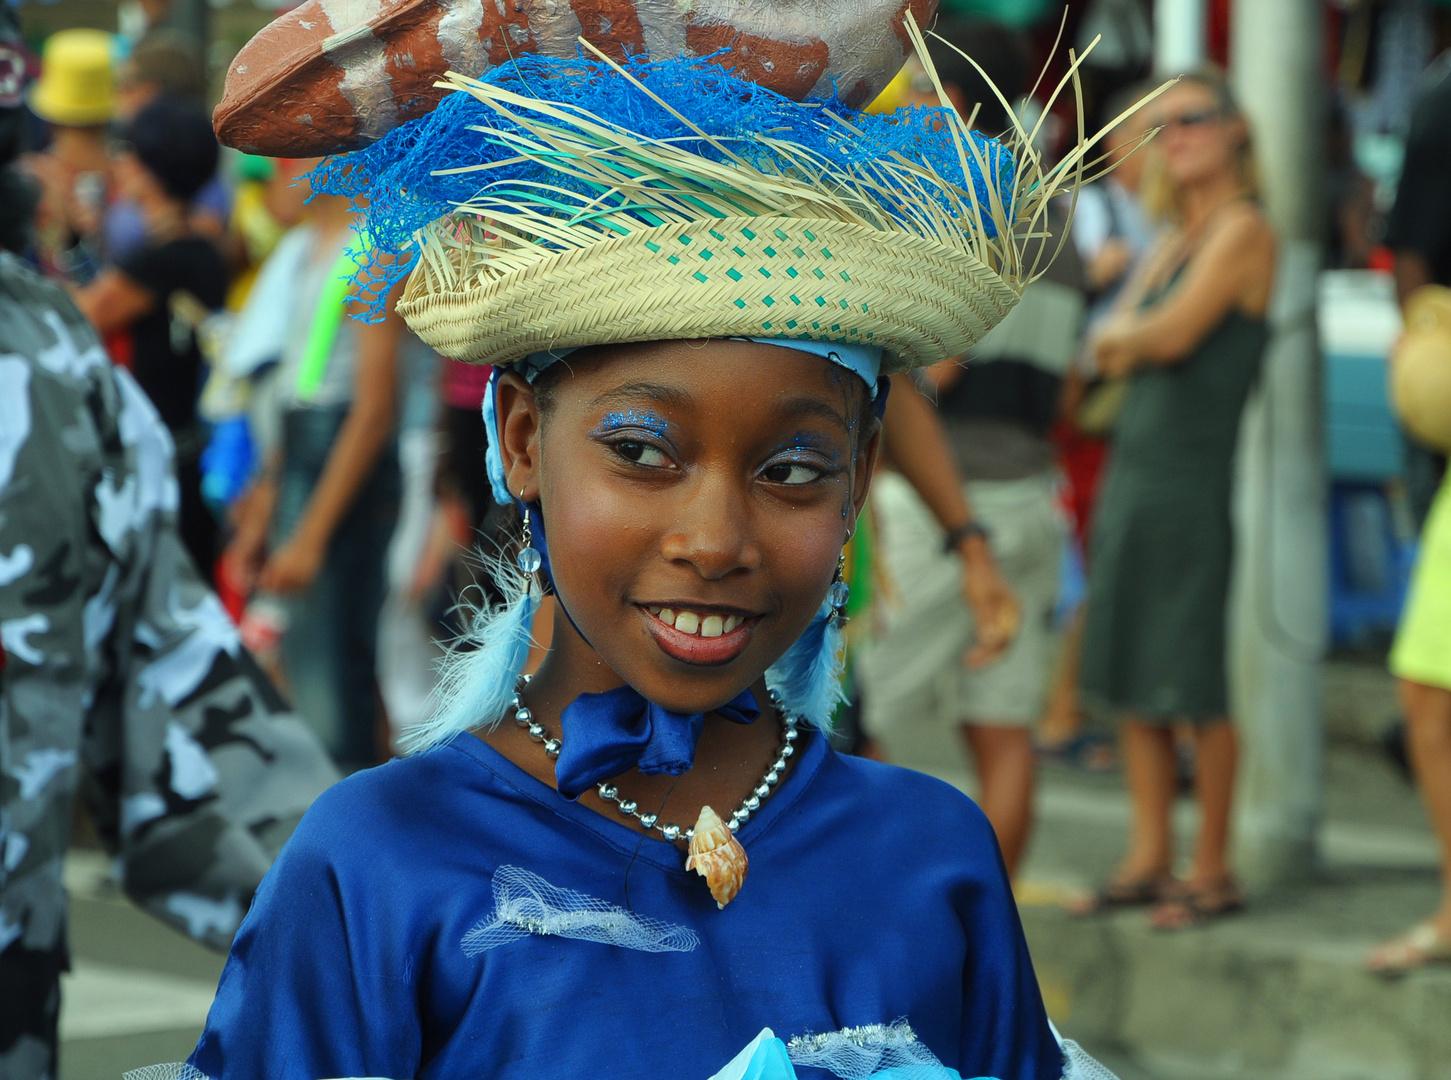 karneval auf martinique 2